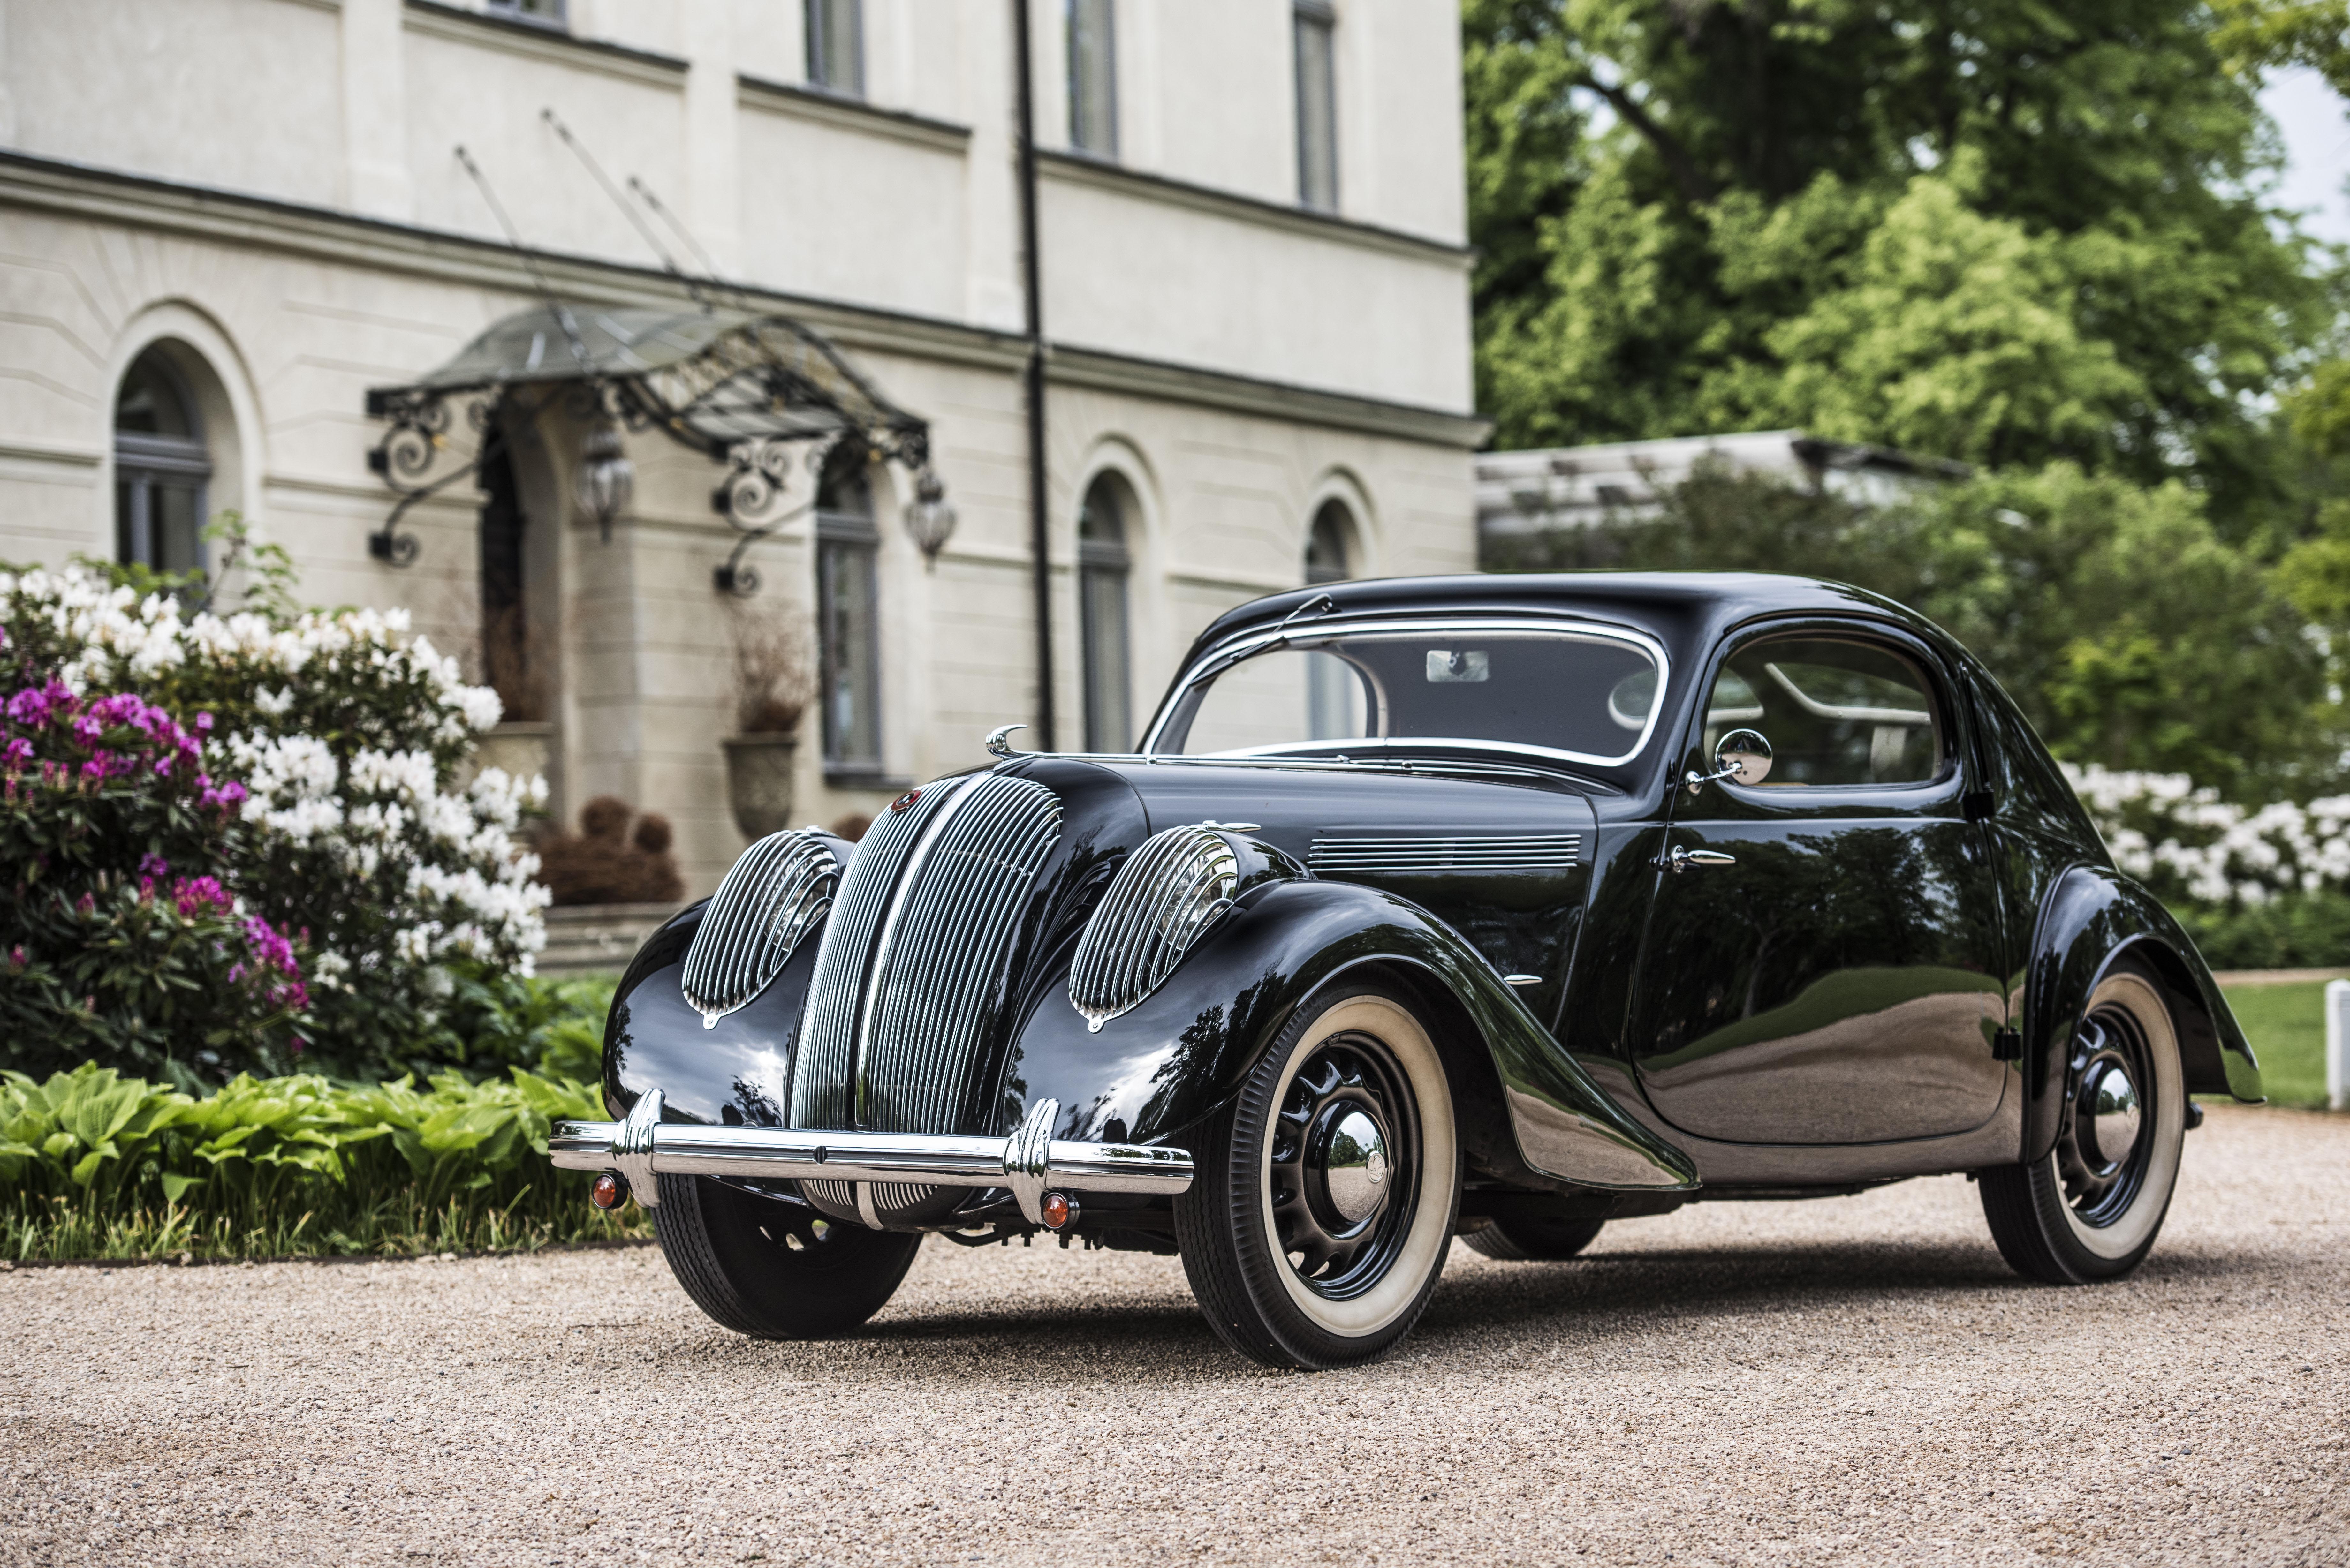 SKODA POPULAR Monte Carlo (1936–1939): The elegant model with rally DNA - Image 7